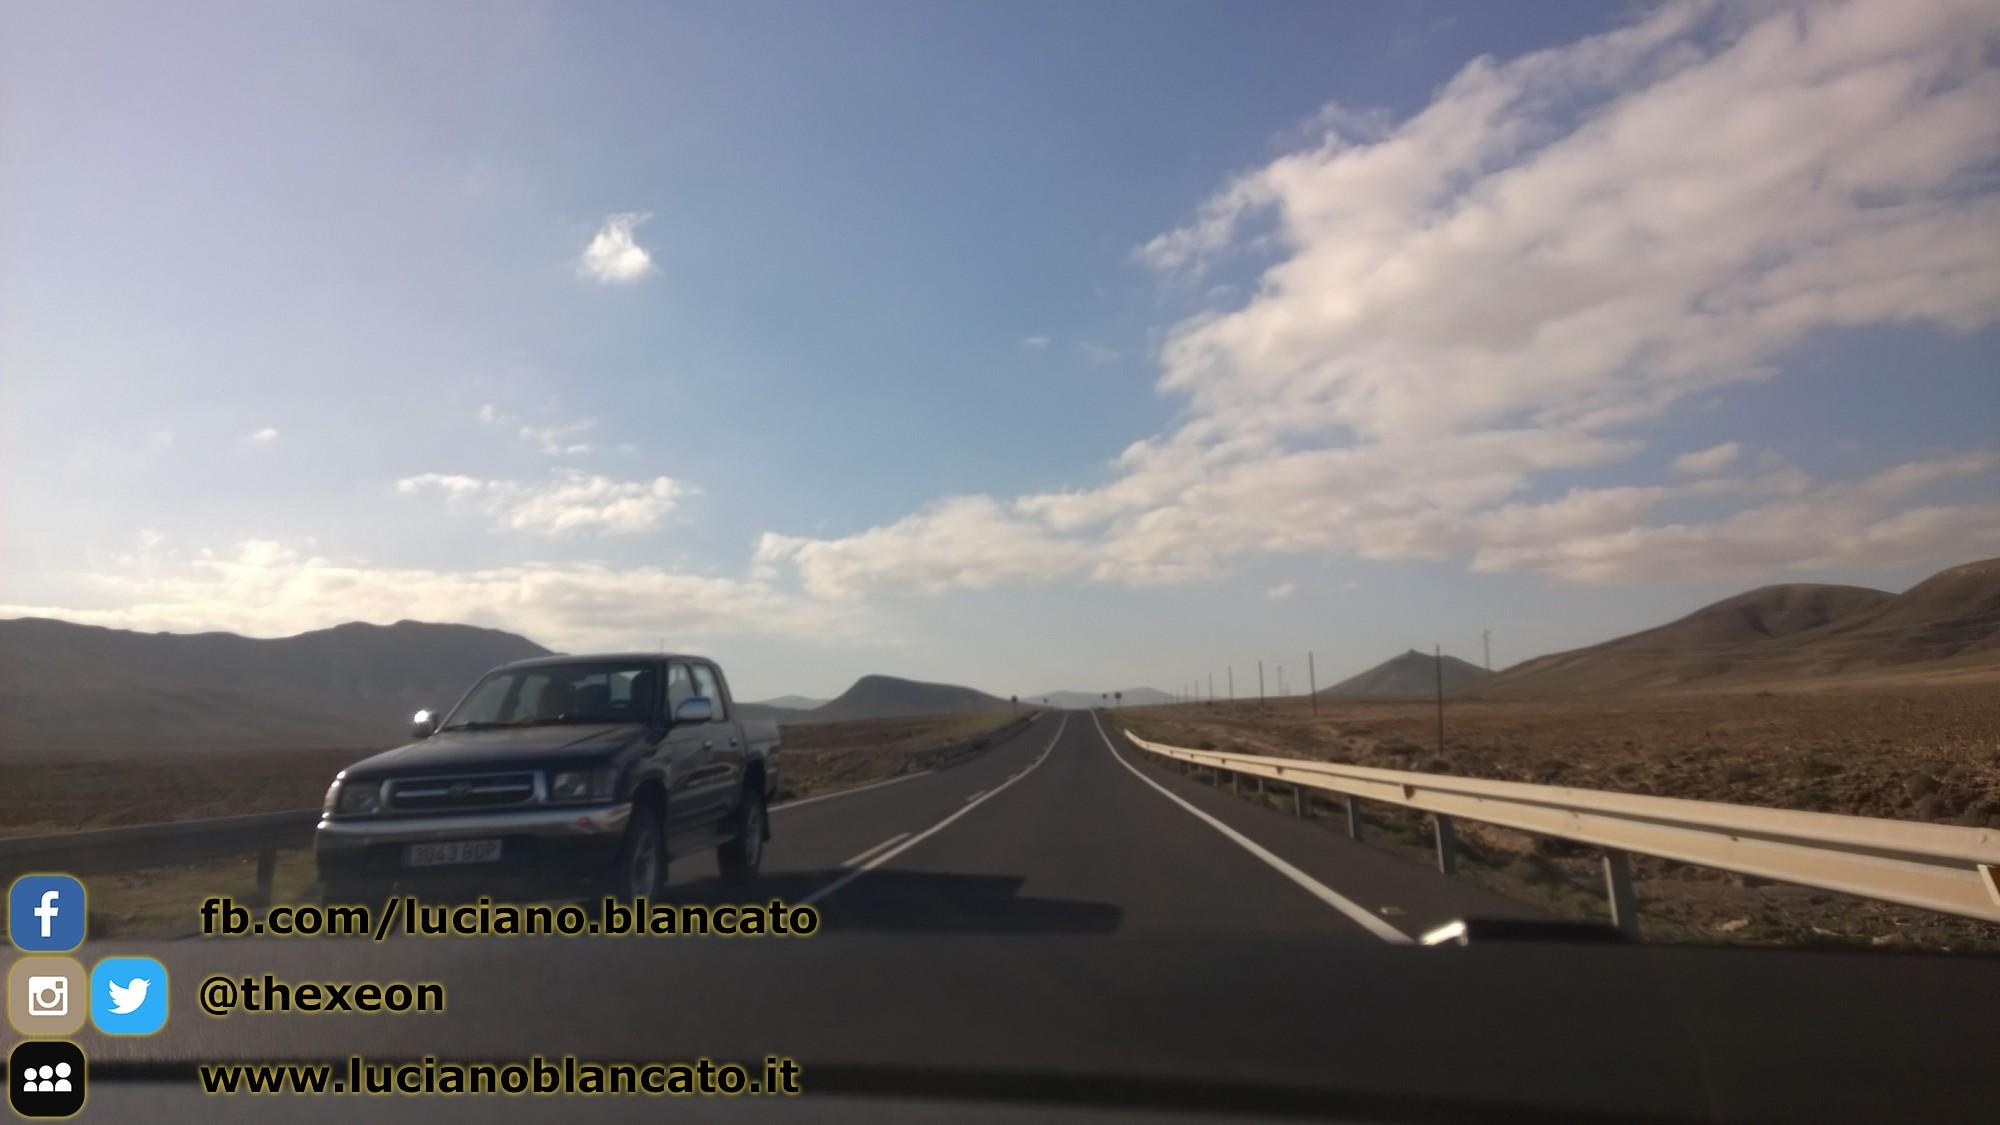 Fuerteventura - Spagna - 2014 - foto n. 0020